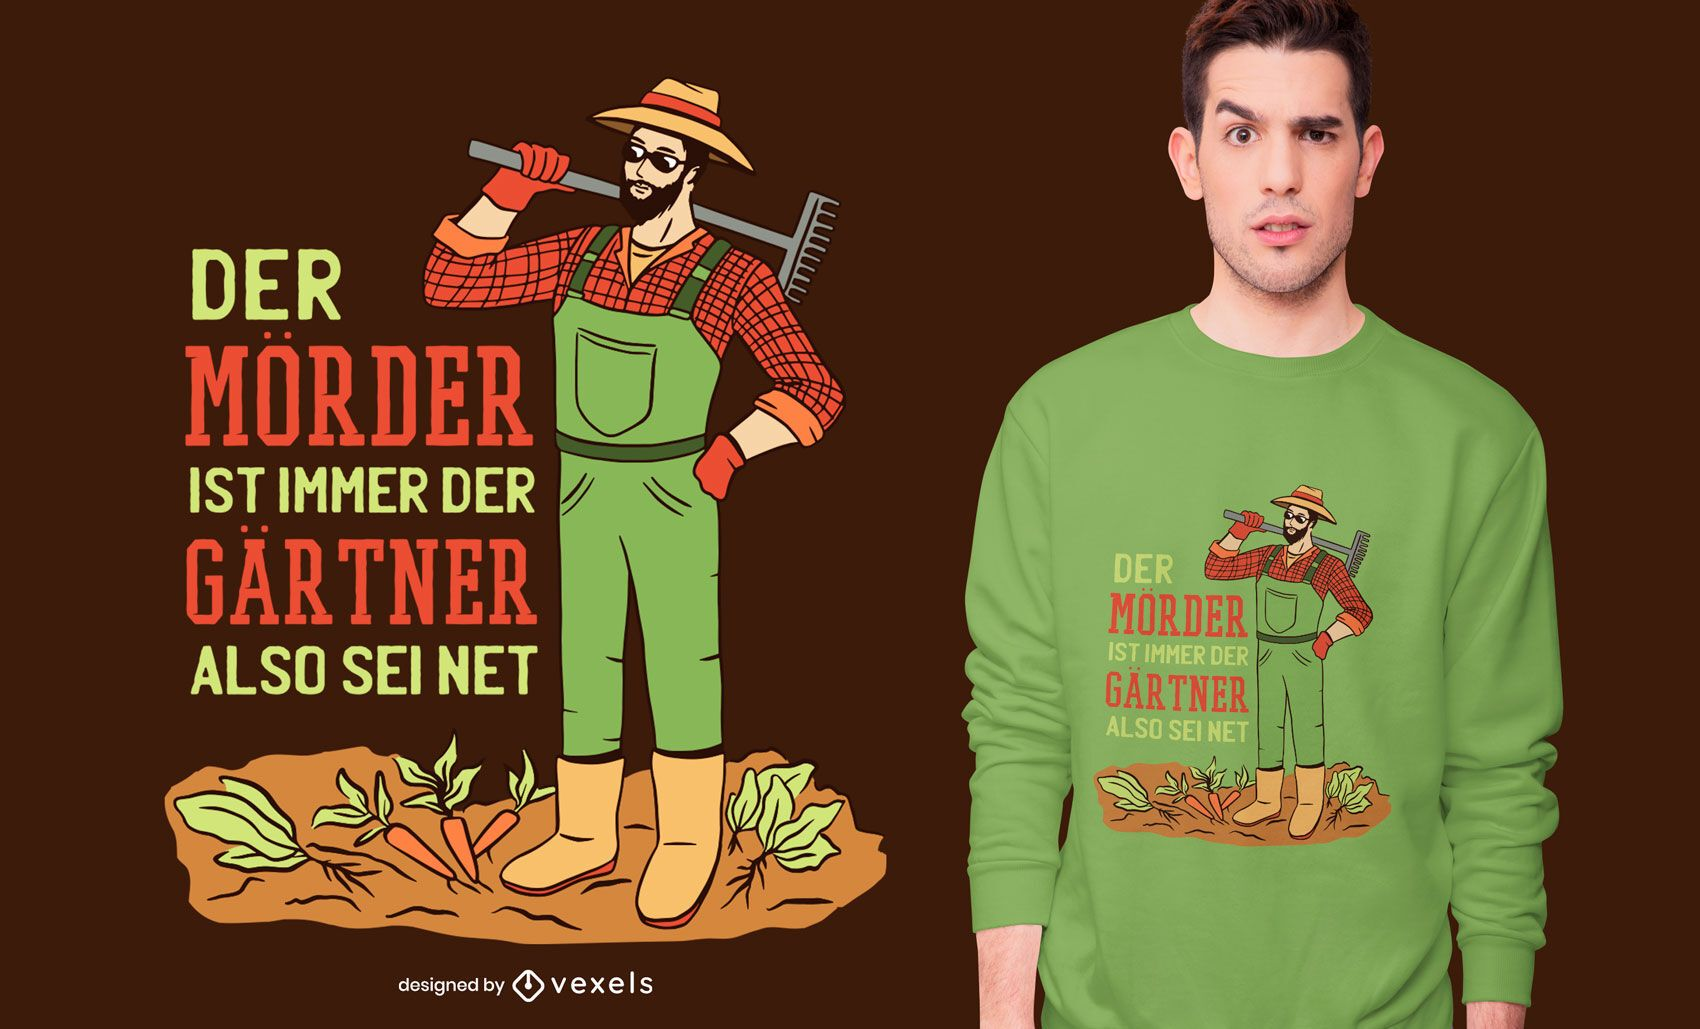 Gardener quote t-shirt design